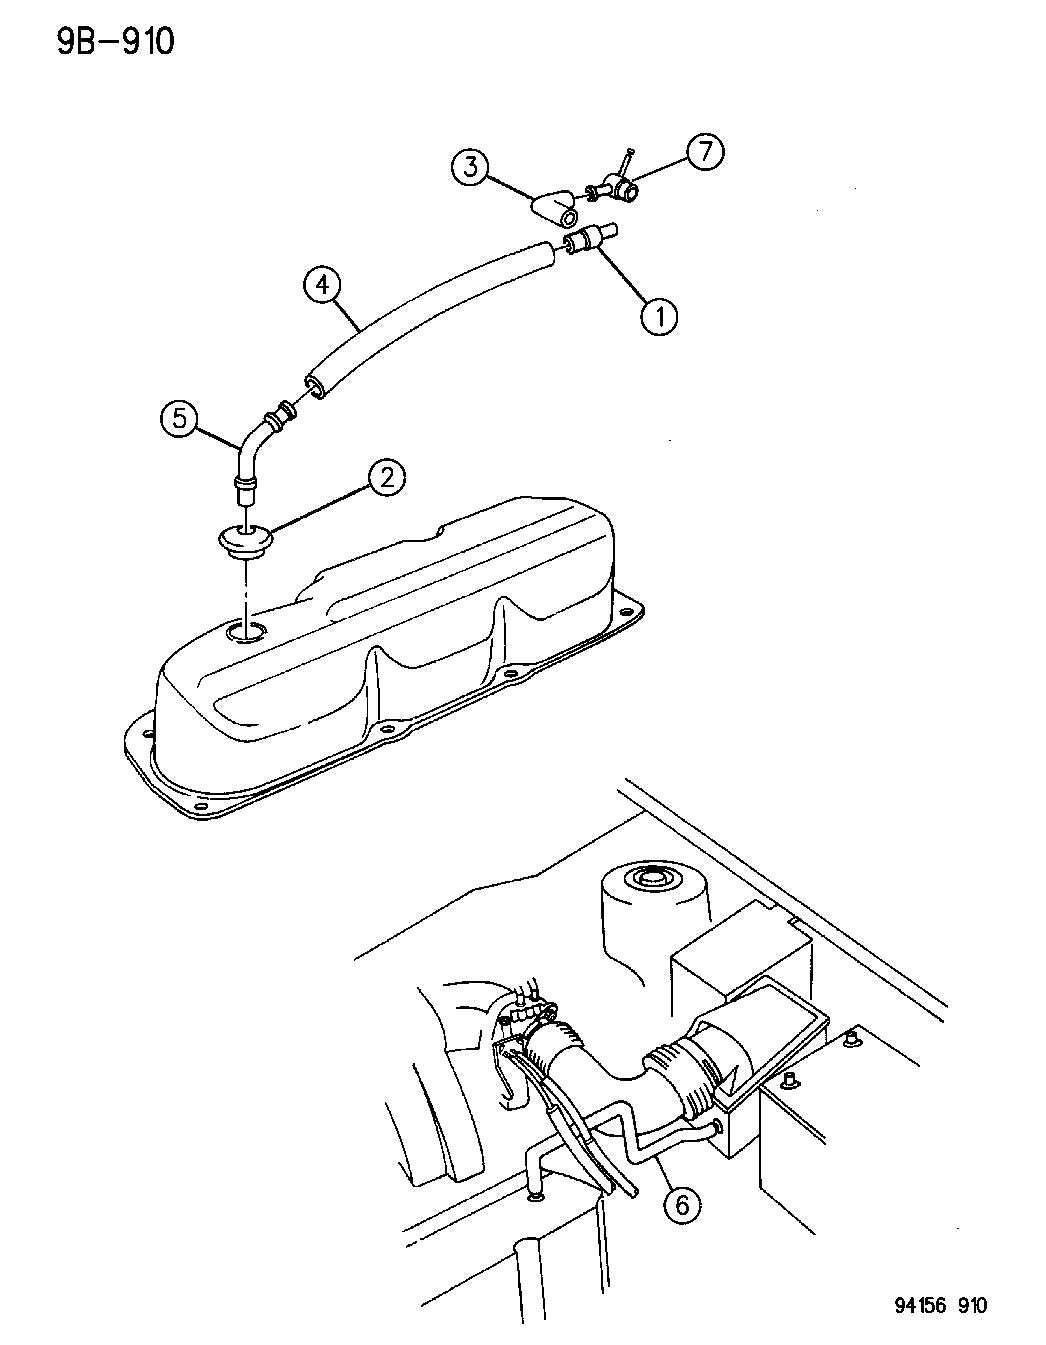 1996 Dodge Caravan Engine Diagram